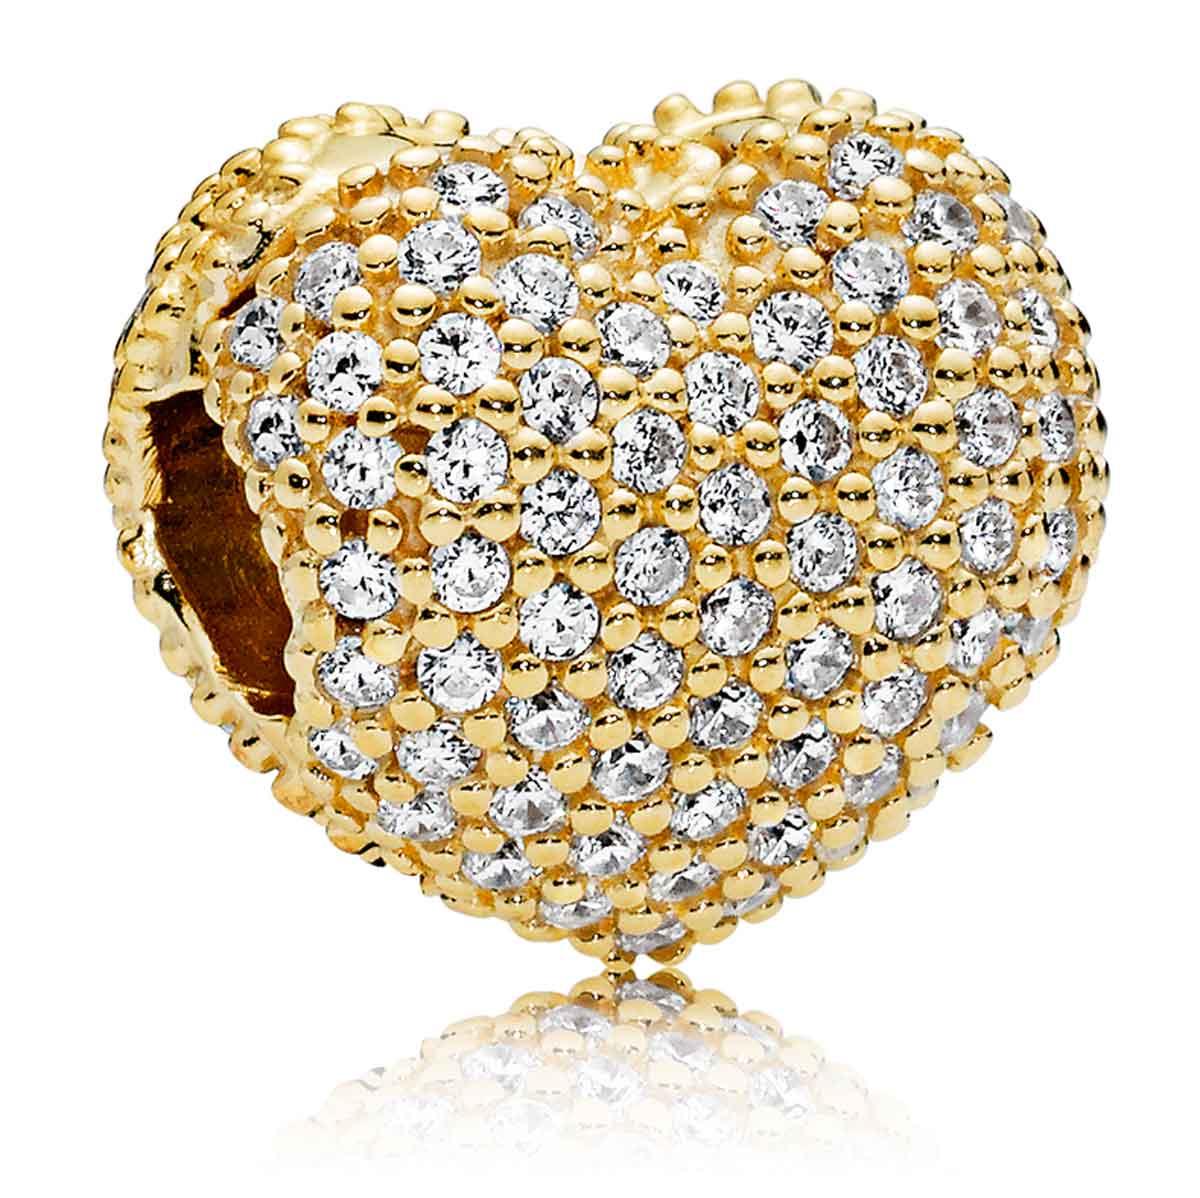 Pandora Shine Pave Open My Heart Clip 767156cz